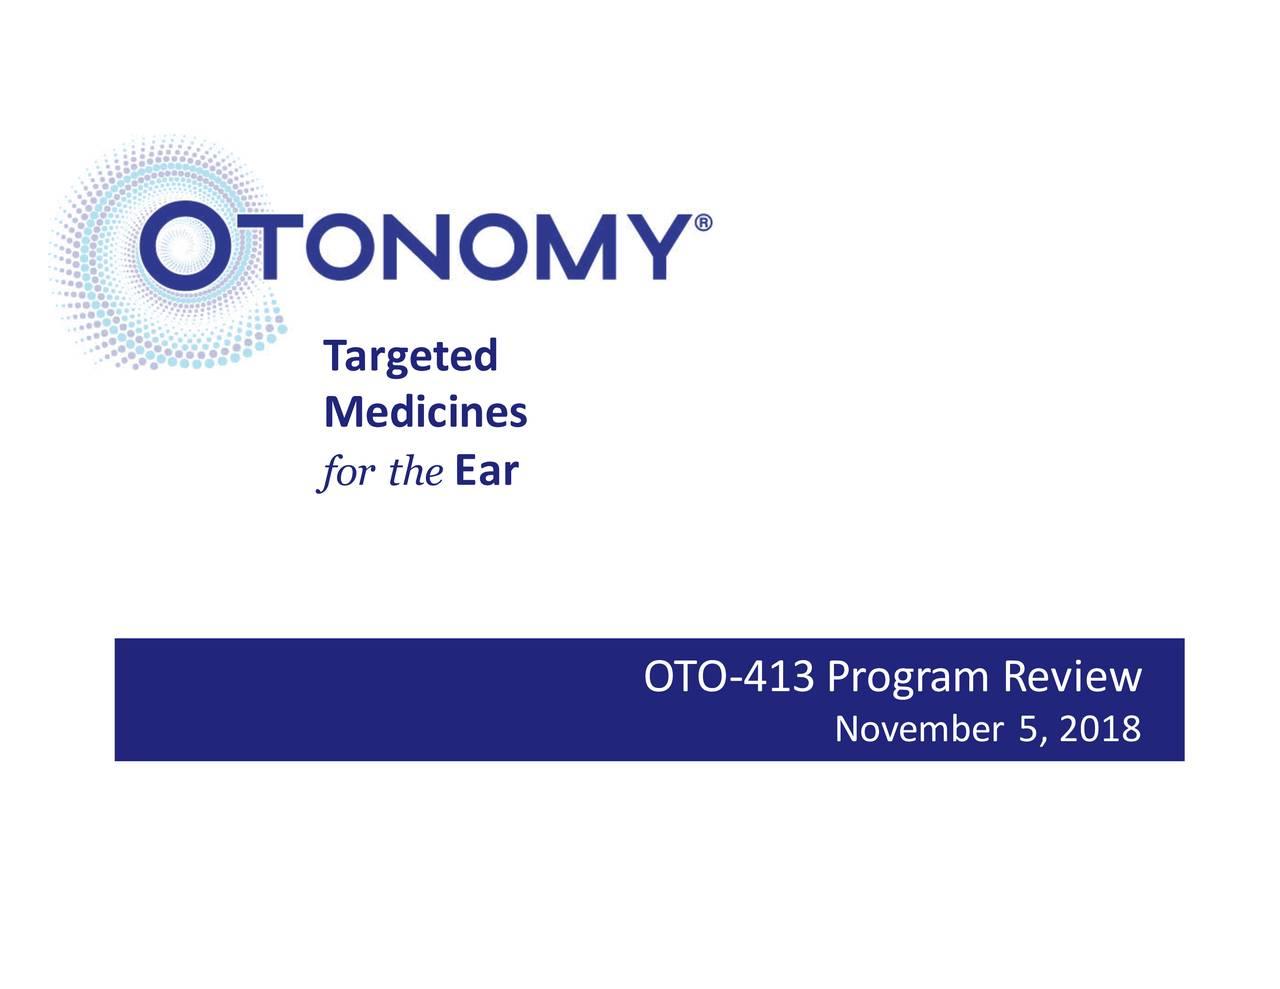 Medicines for thEar OTO-413 Program Review November 5, 2018